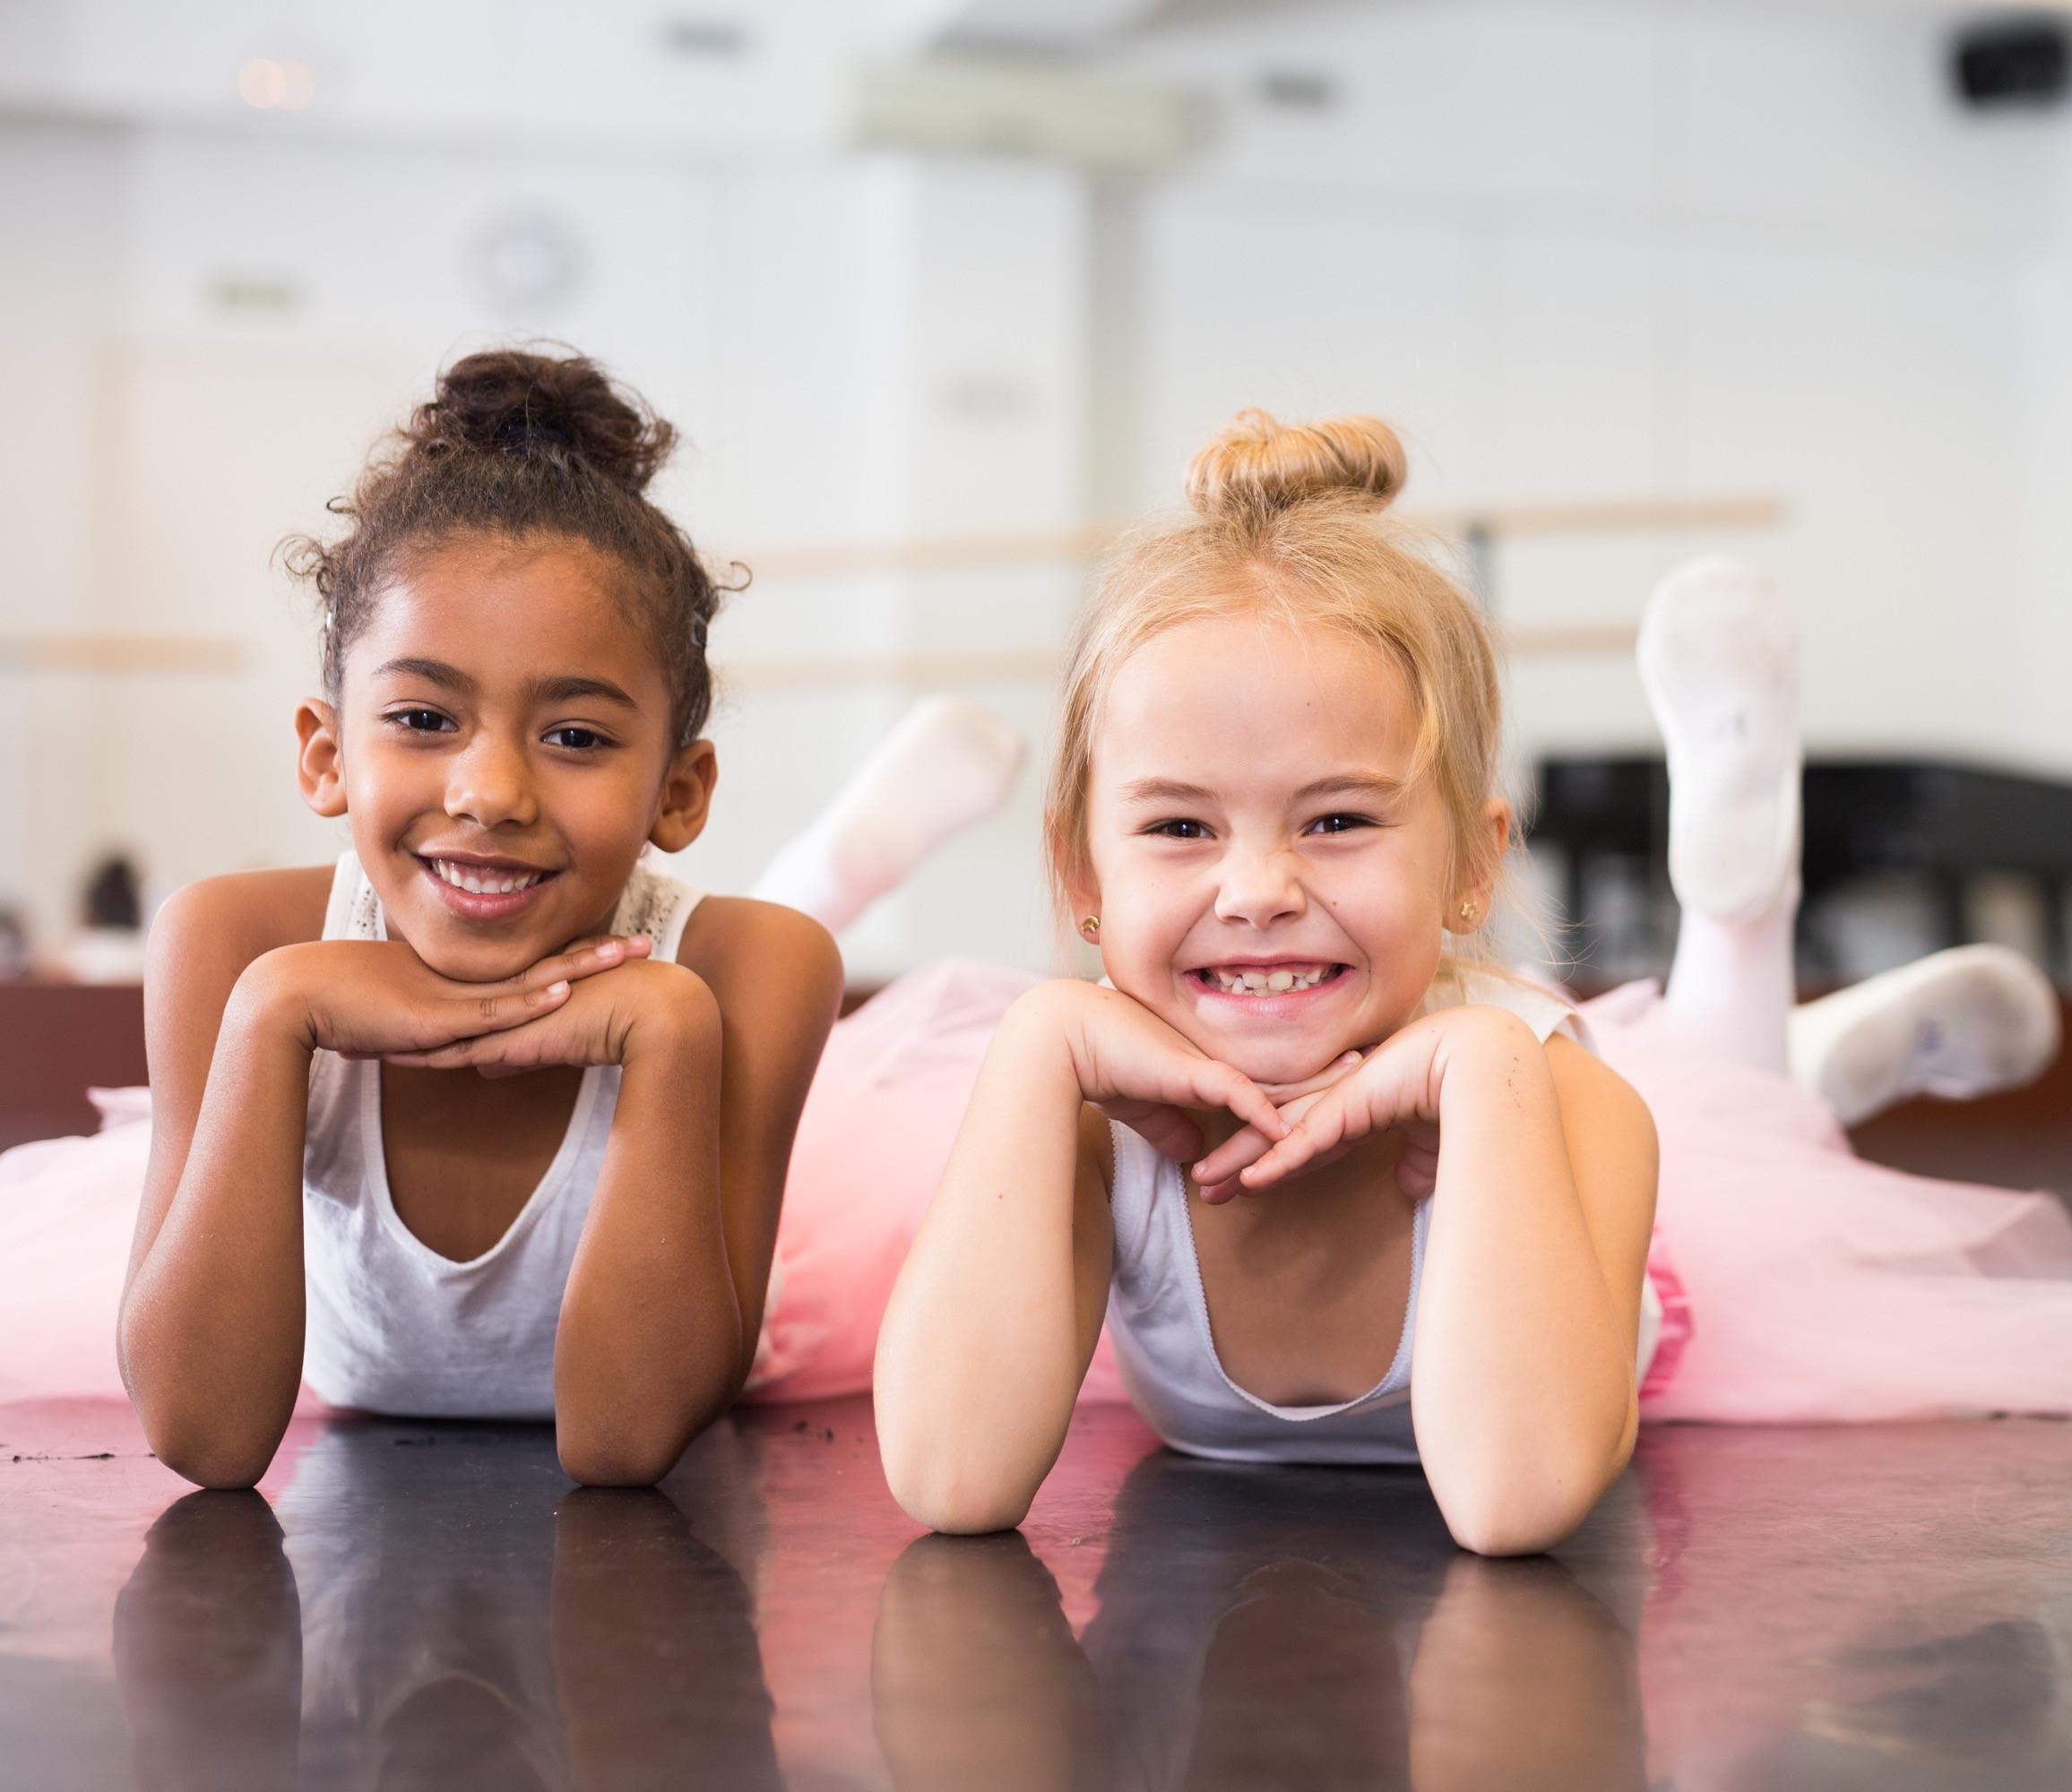 Half-Day Camp: Make Your Own Tutu Ballet